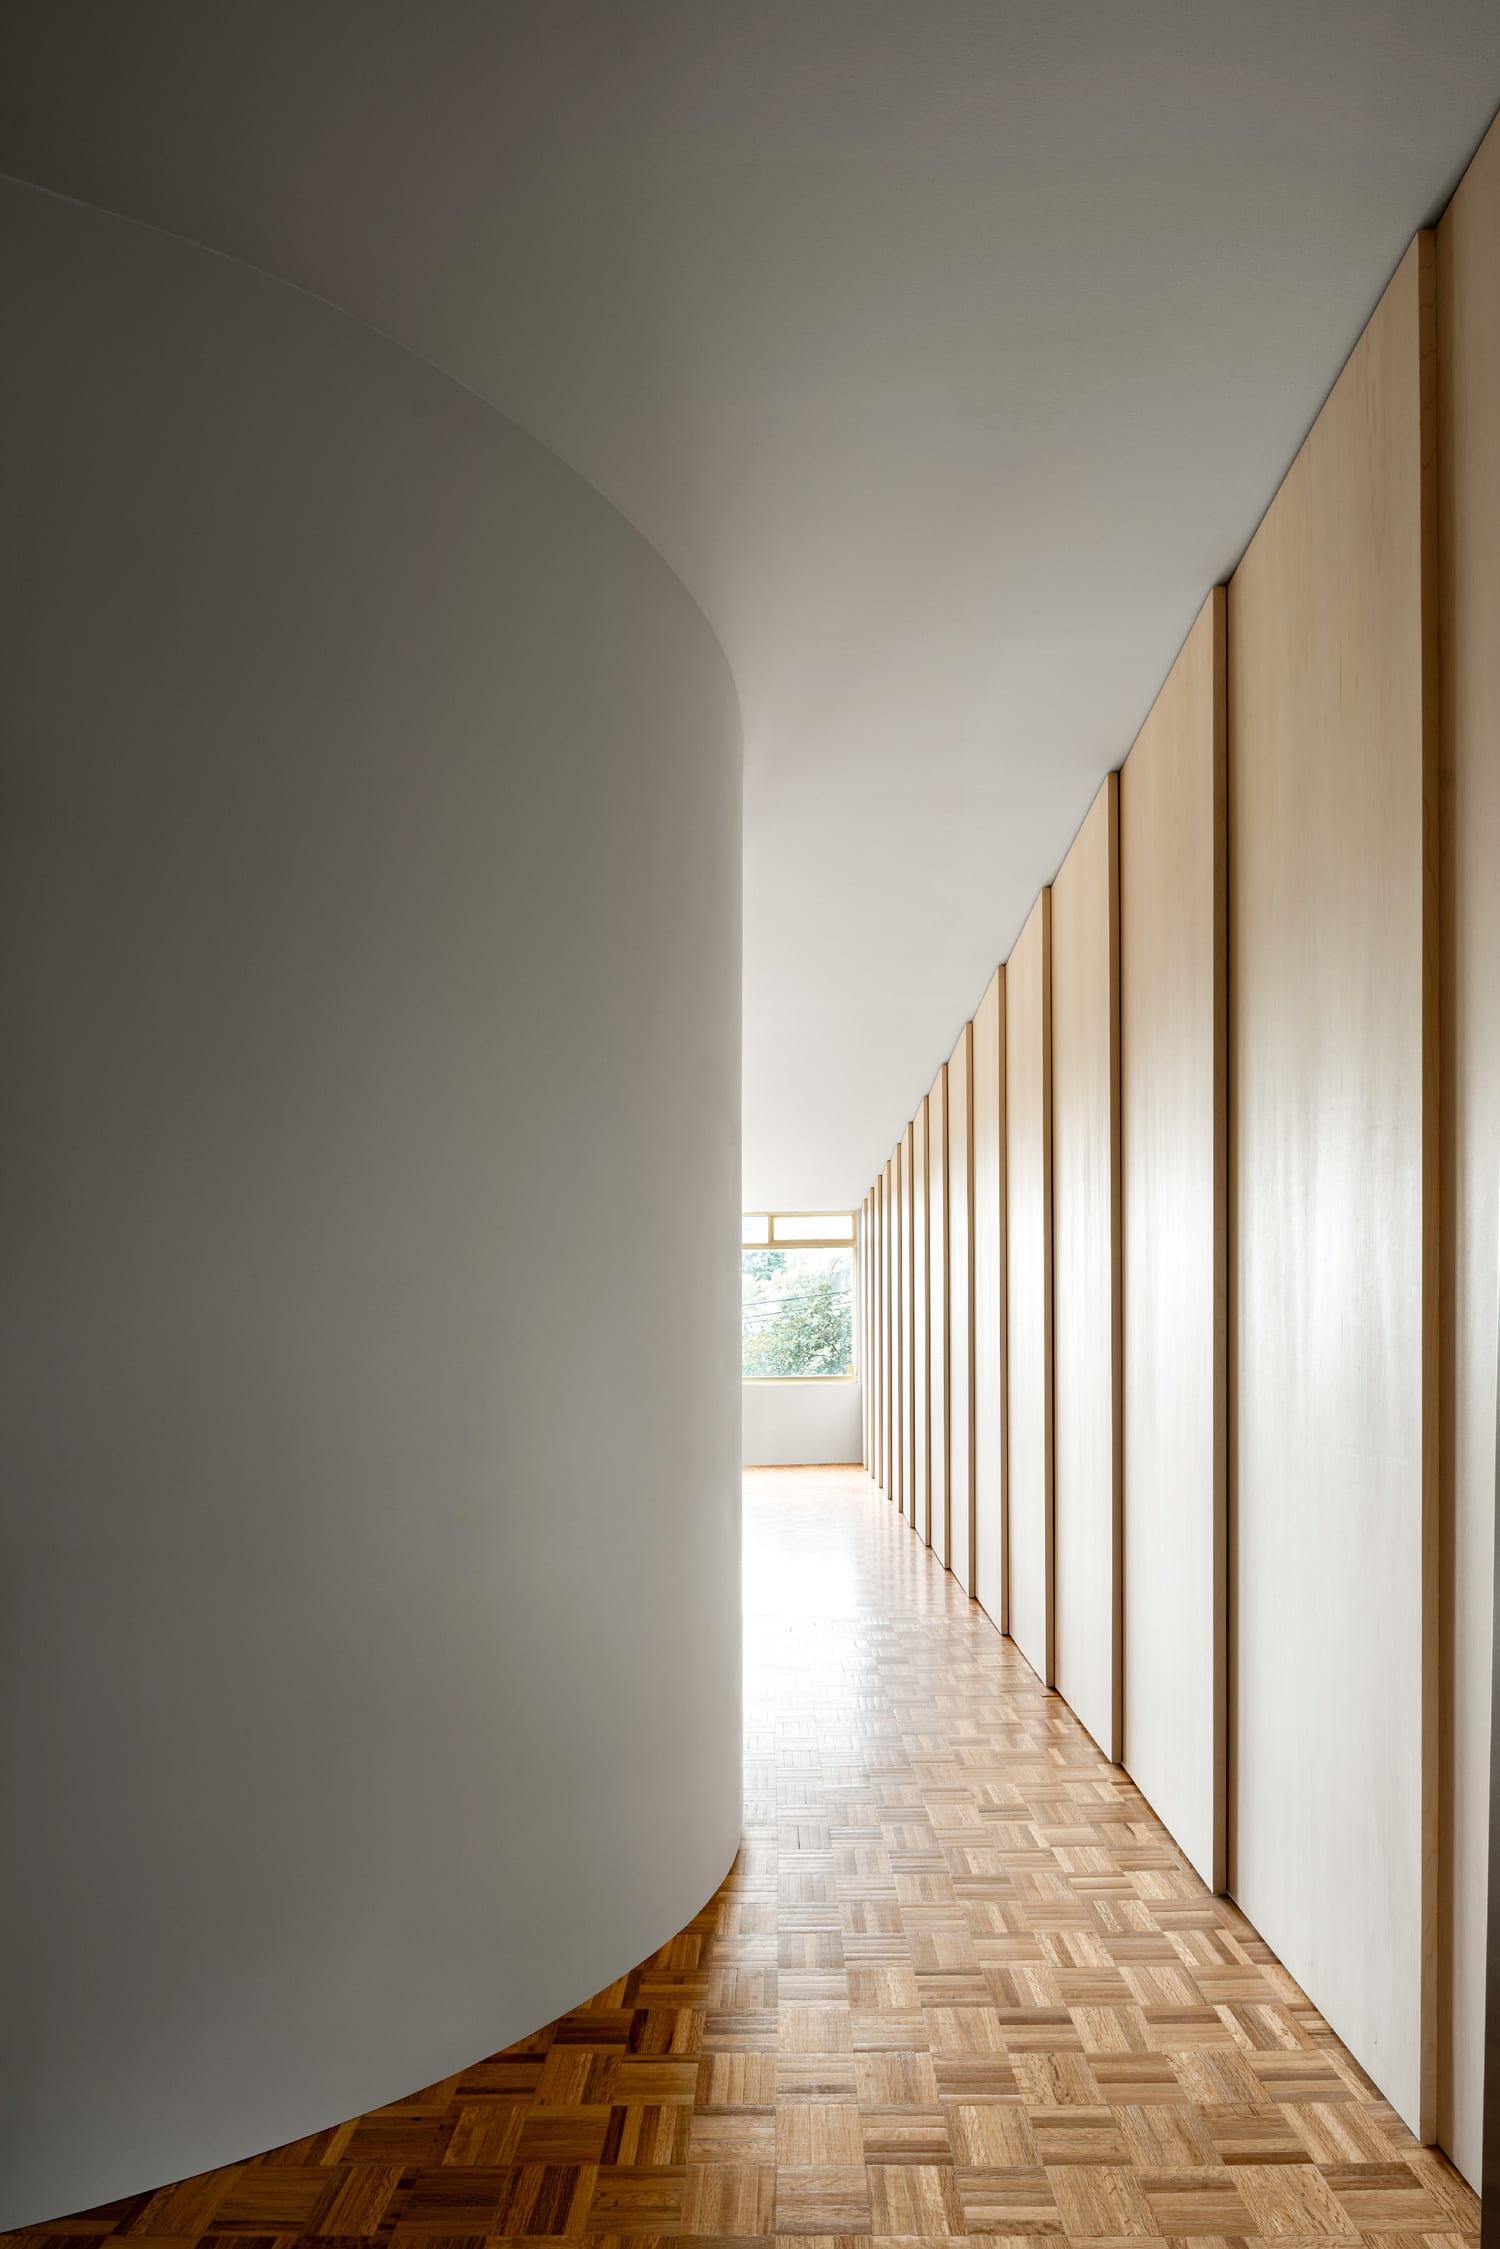 Casa Kaspé in Mexico City by Zeller & Moye | Yellowtrace